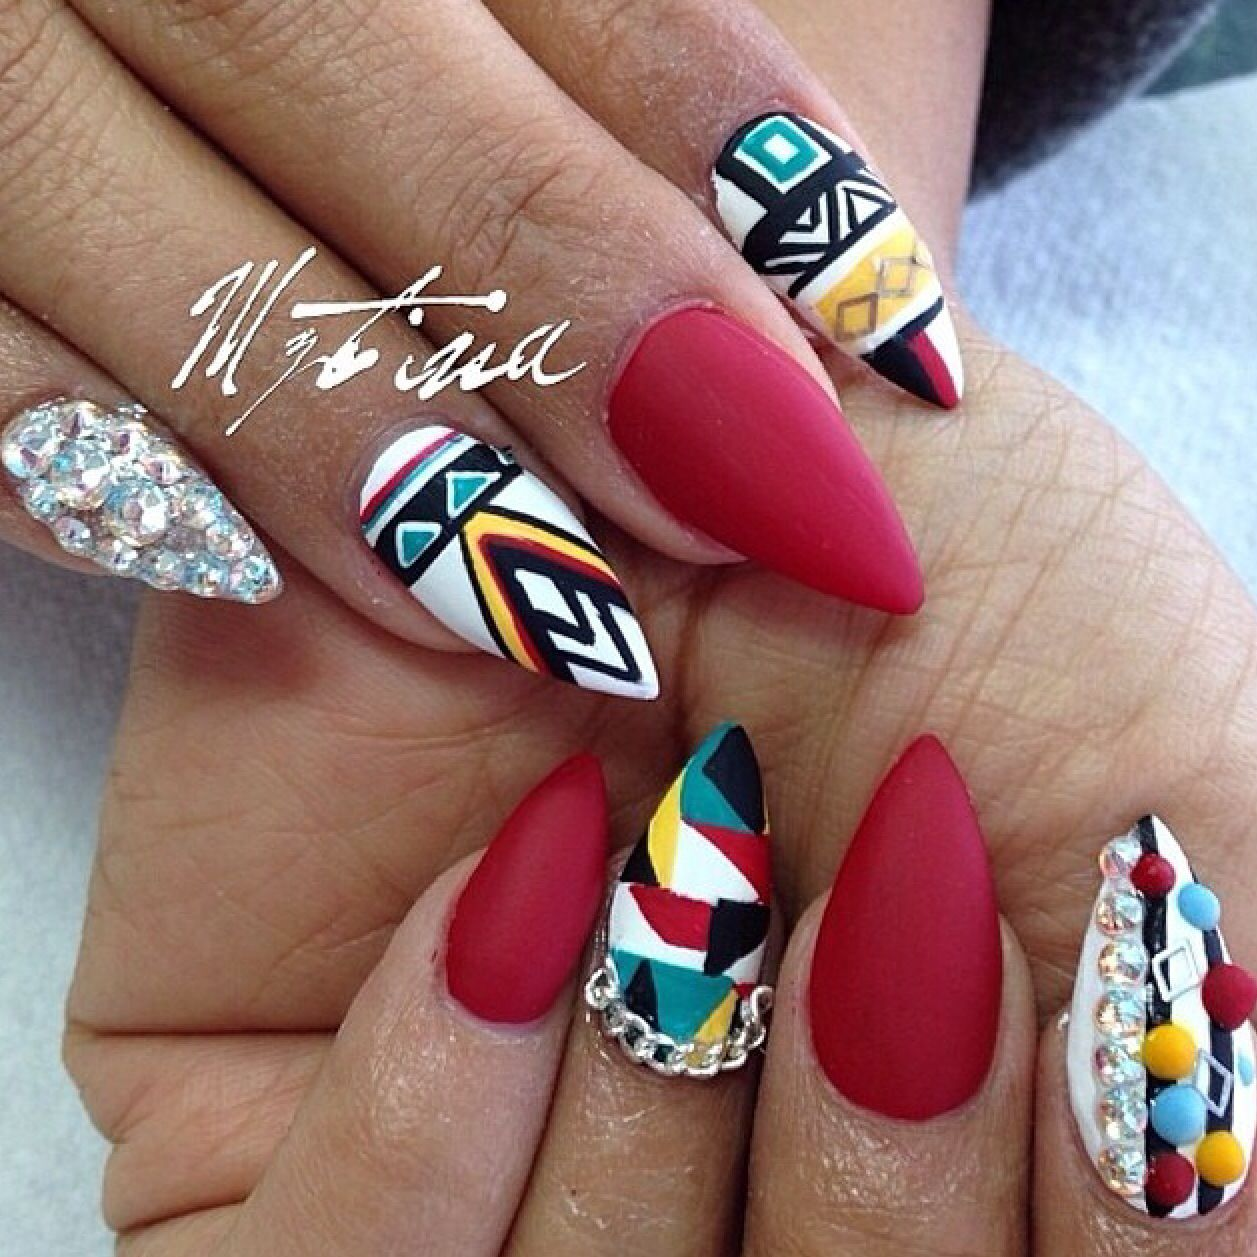 Pinterest : Coolvxbez | ☆nails☆ | Pinterest | Nail nail, Gorgeous ...